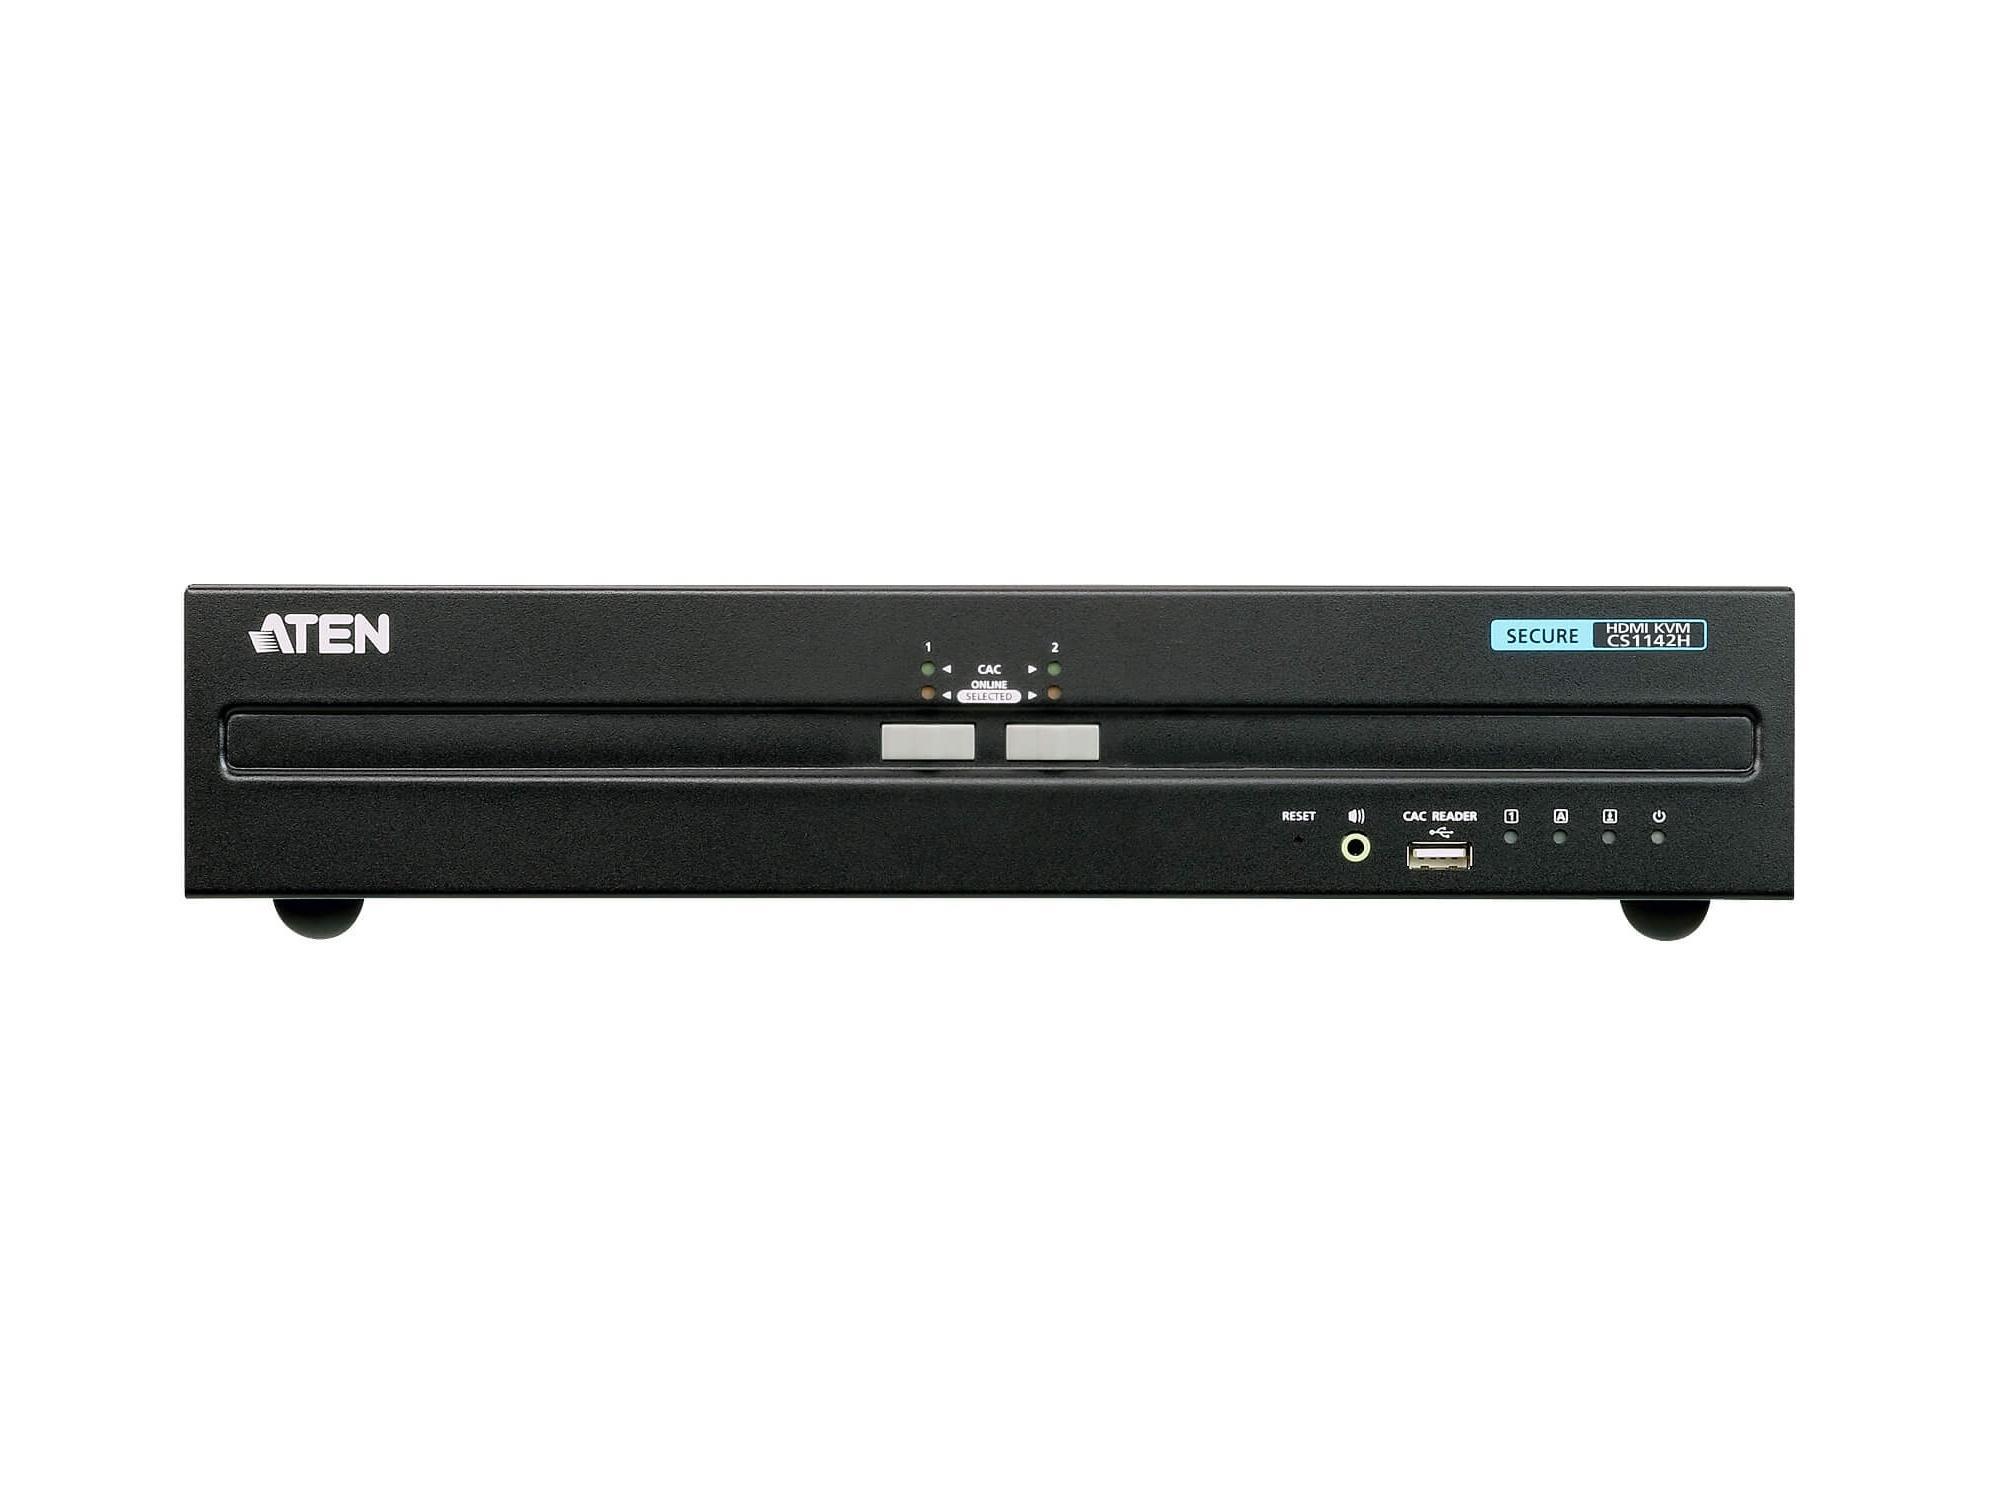 Aten CS1142H 2-Port USB HDMI Dual Display Secure KVM Switch (PSS PP v3.0 Compliant)